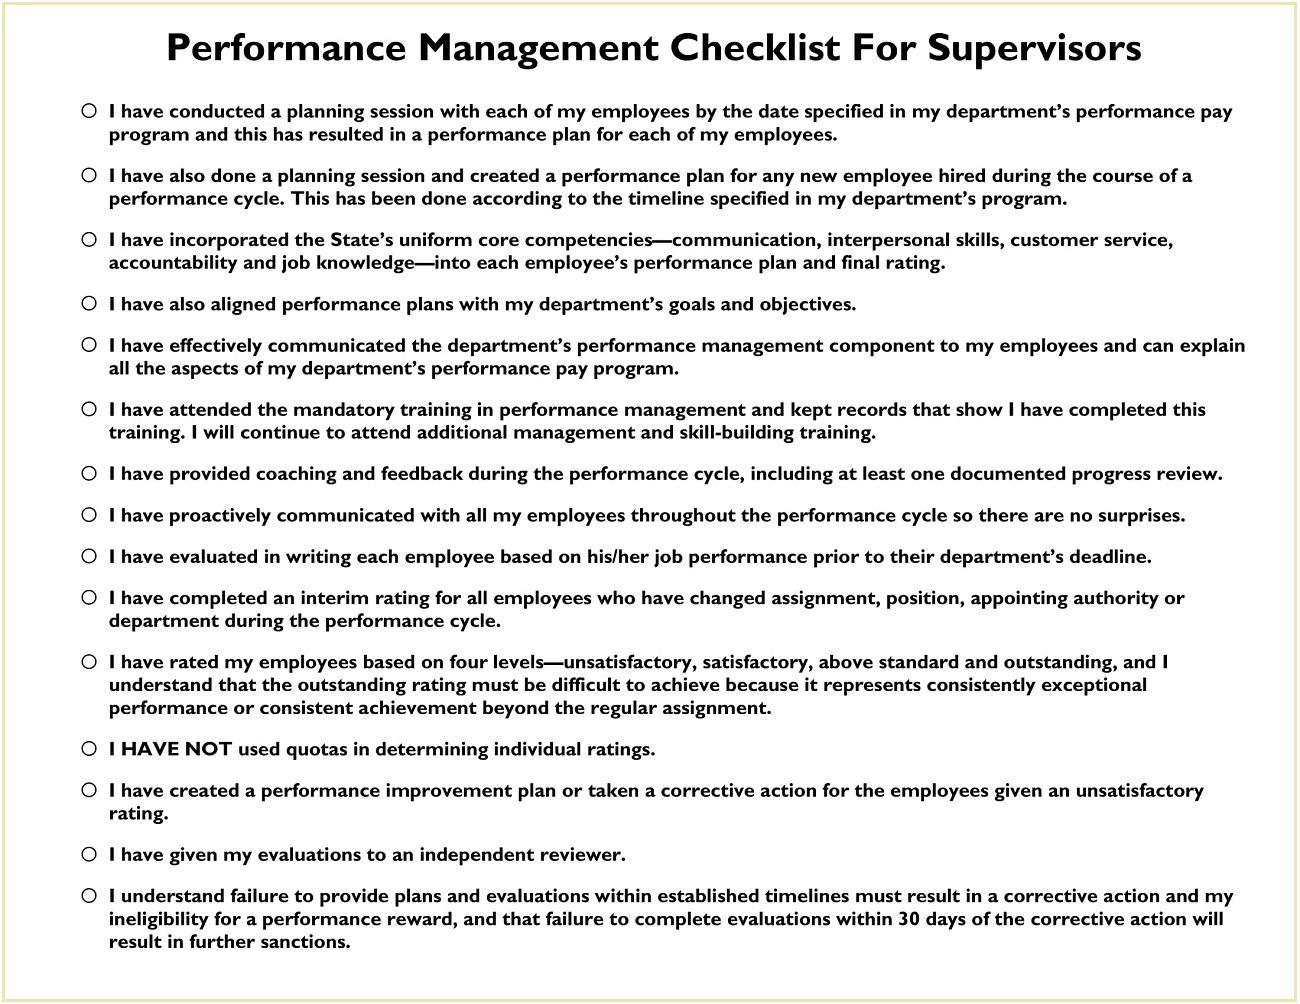 Supervisor Performance Management Checklist Template PDF